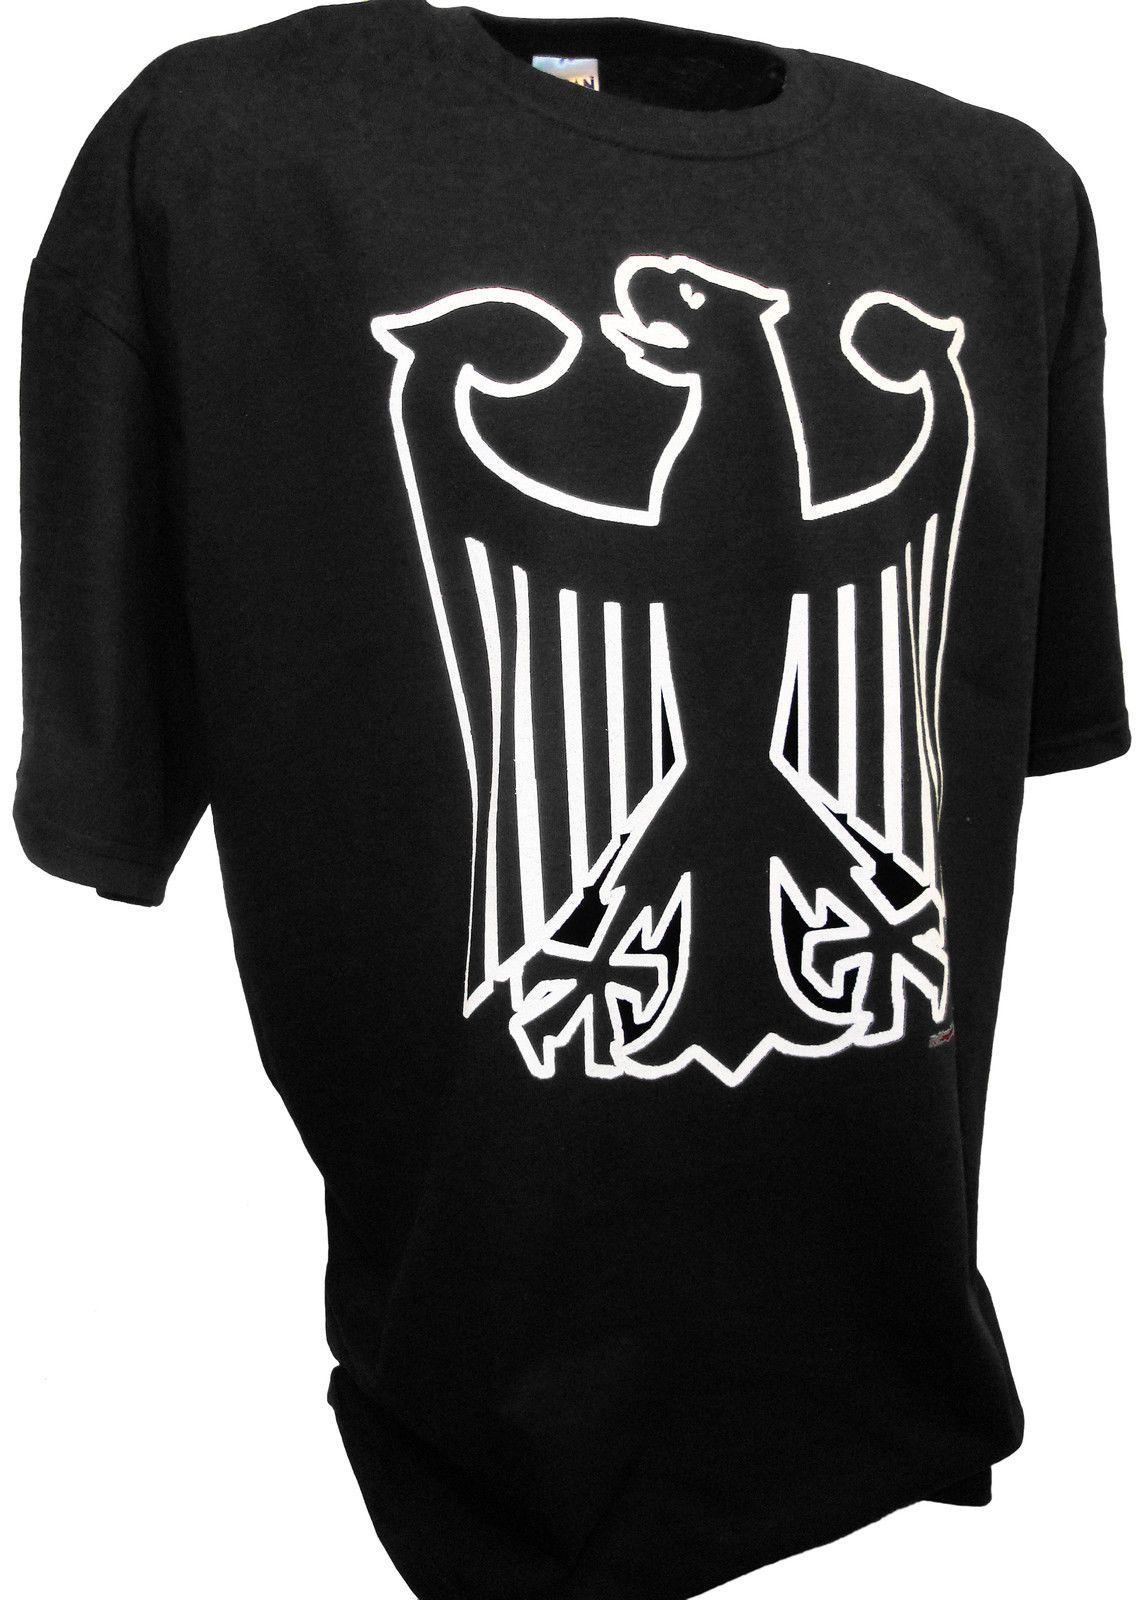 German Eagle Crest Deutschland Germany Flag Logo Ww2 Panzer Tank Mg42 T  Shirt summer Hot Sale Men T-Shirt Top New Tee Print